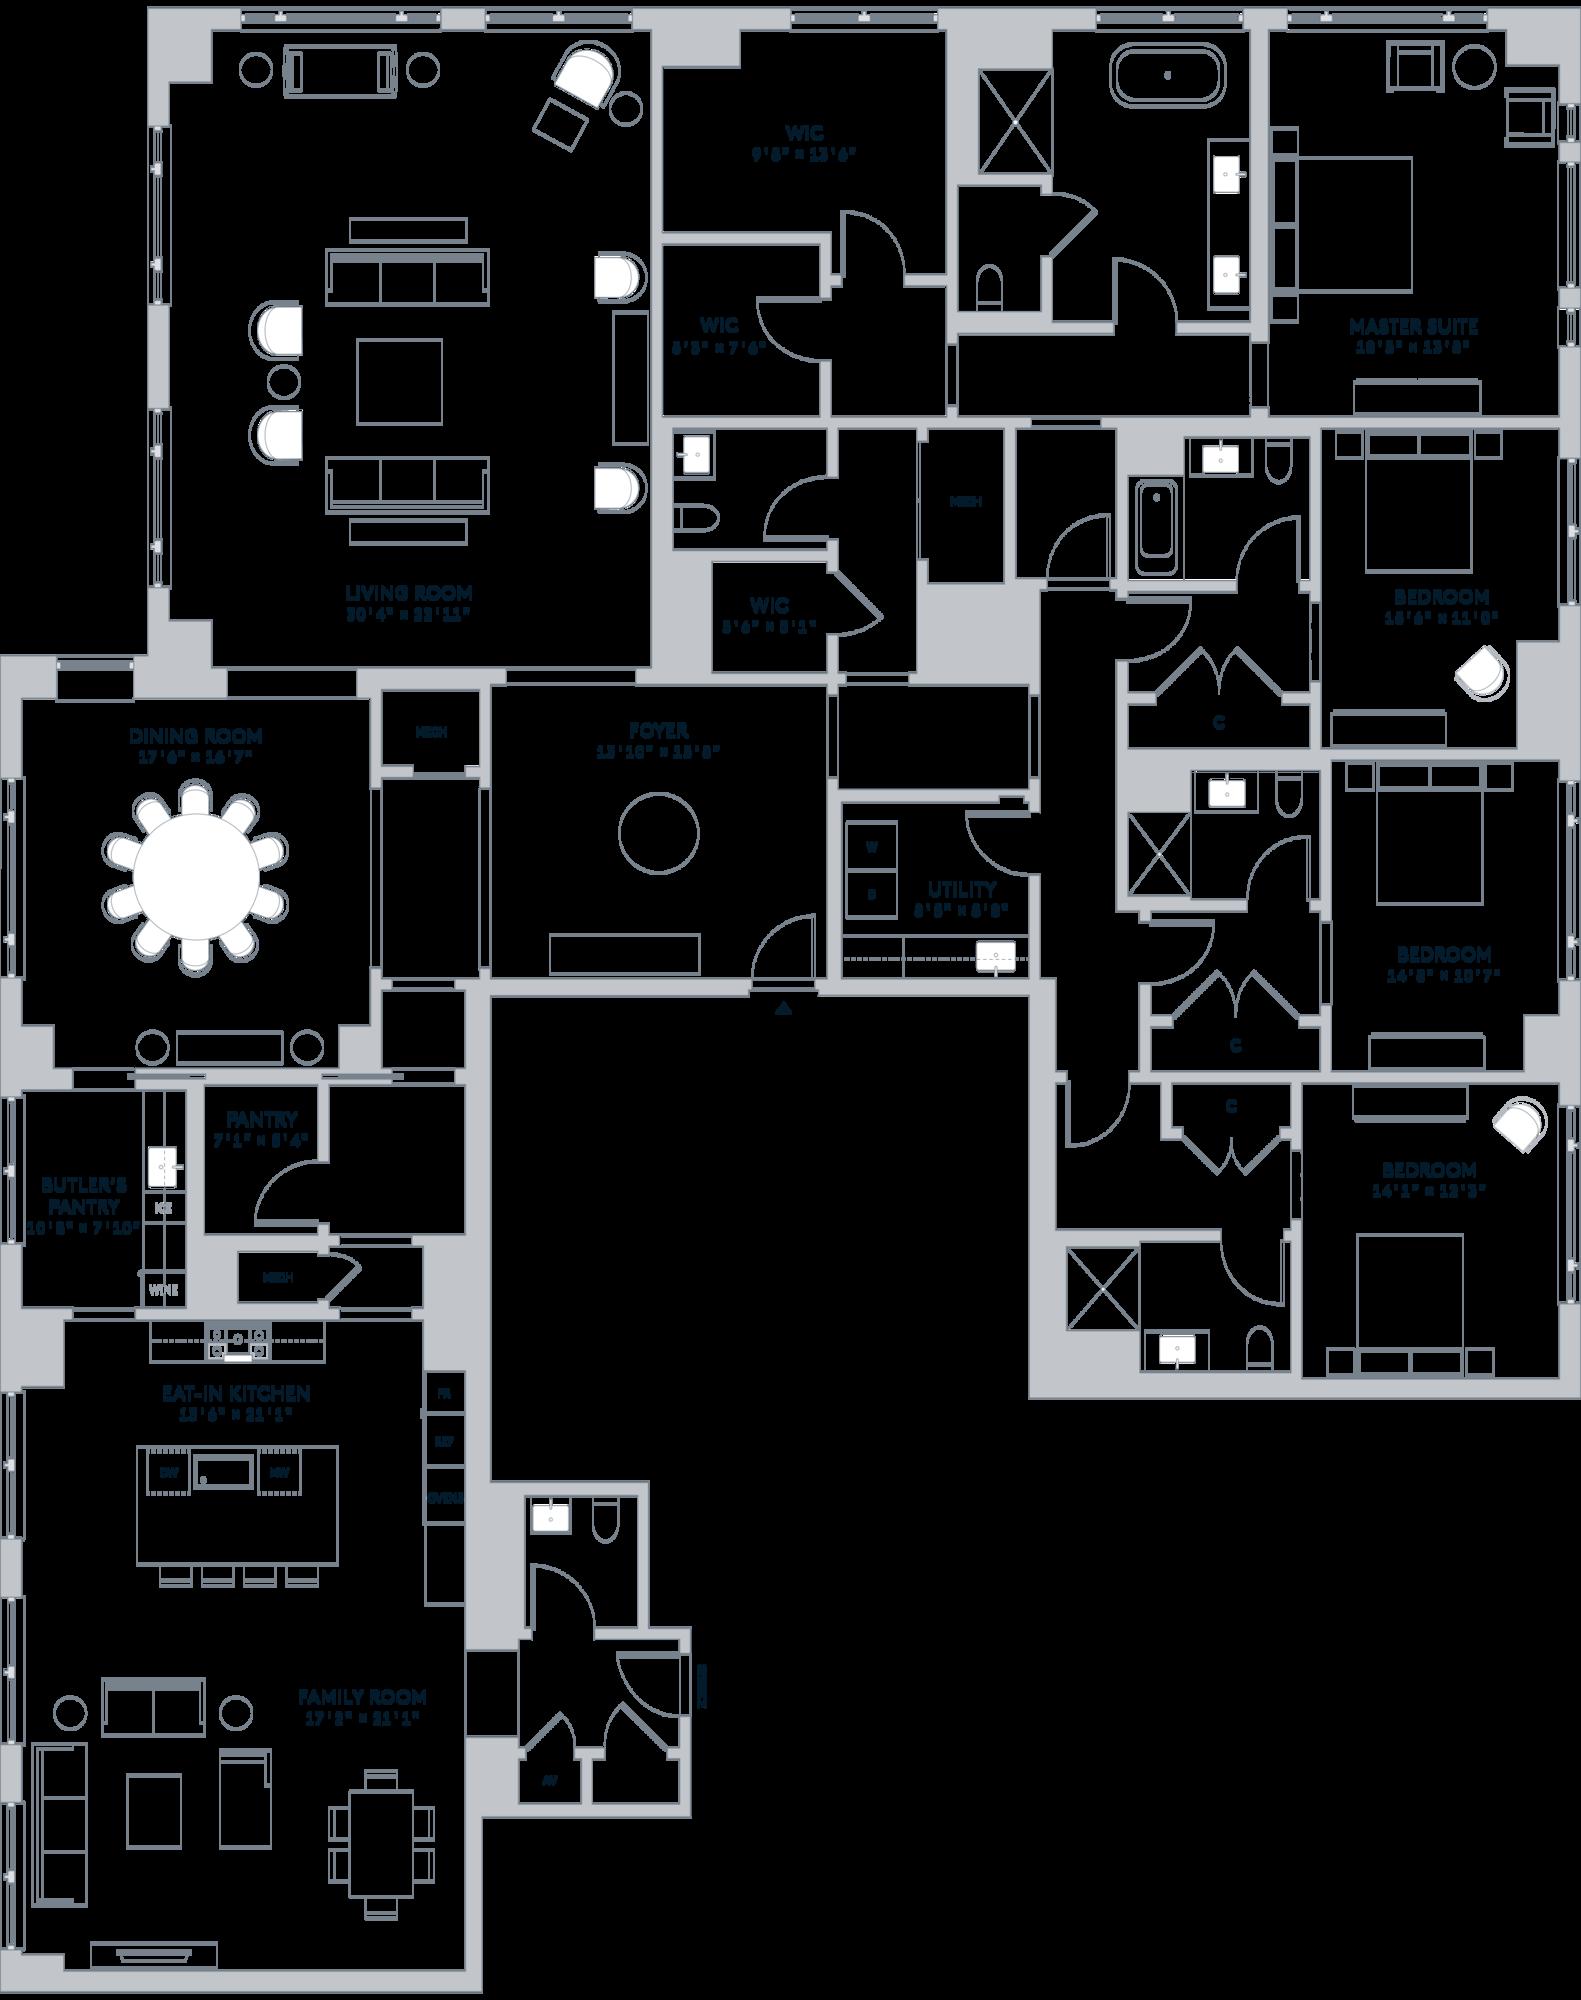 One Bennett Park Chicago Residence 5509 5130 Ft 476 M House Layout Plans Apartment Floor Plans Small House Floor Plans